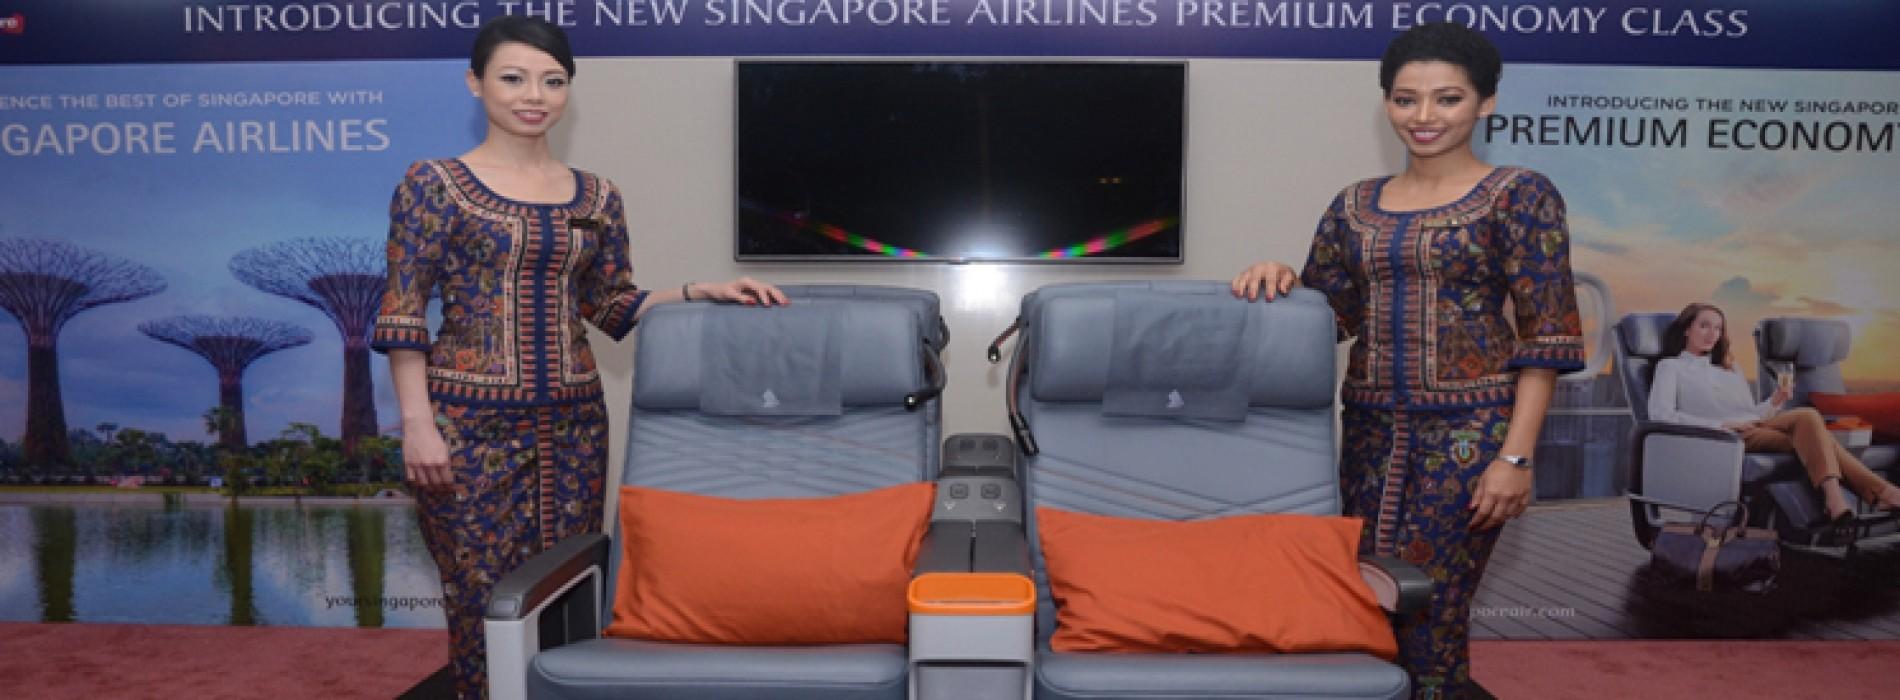 Singapore Airlines unveils new Premium Economy Class Experience in India